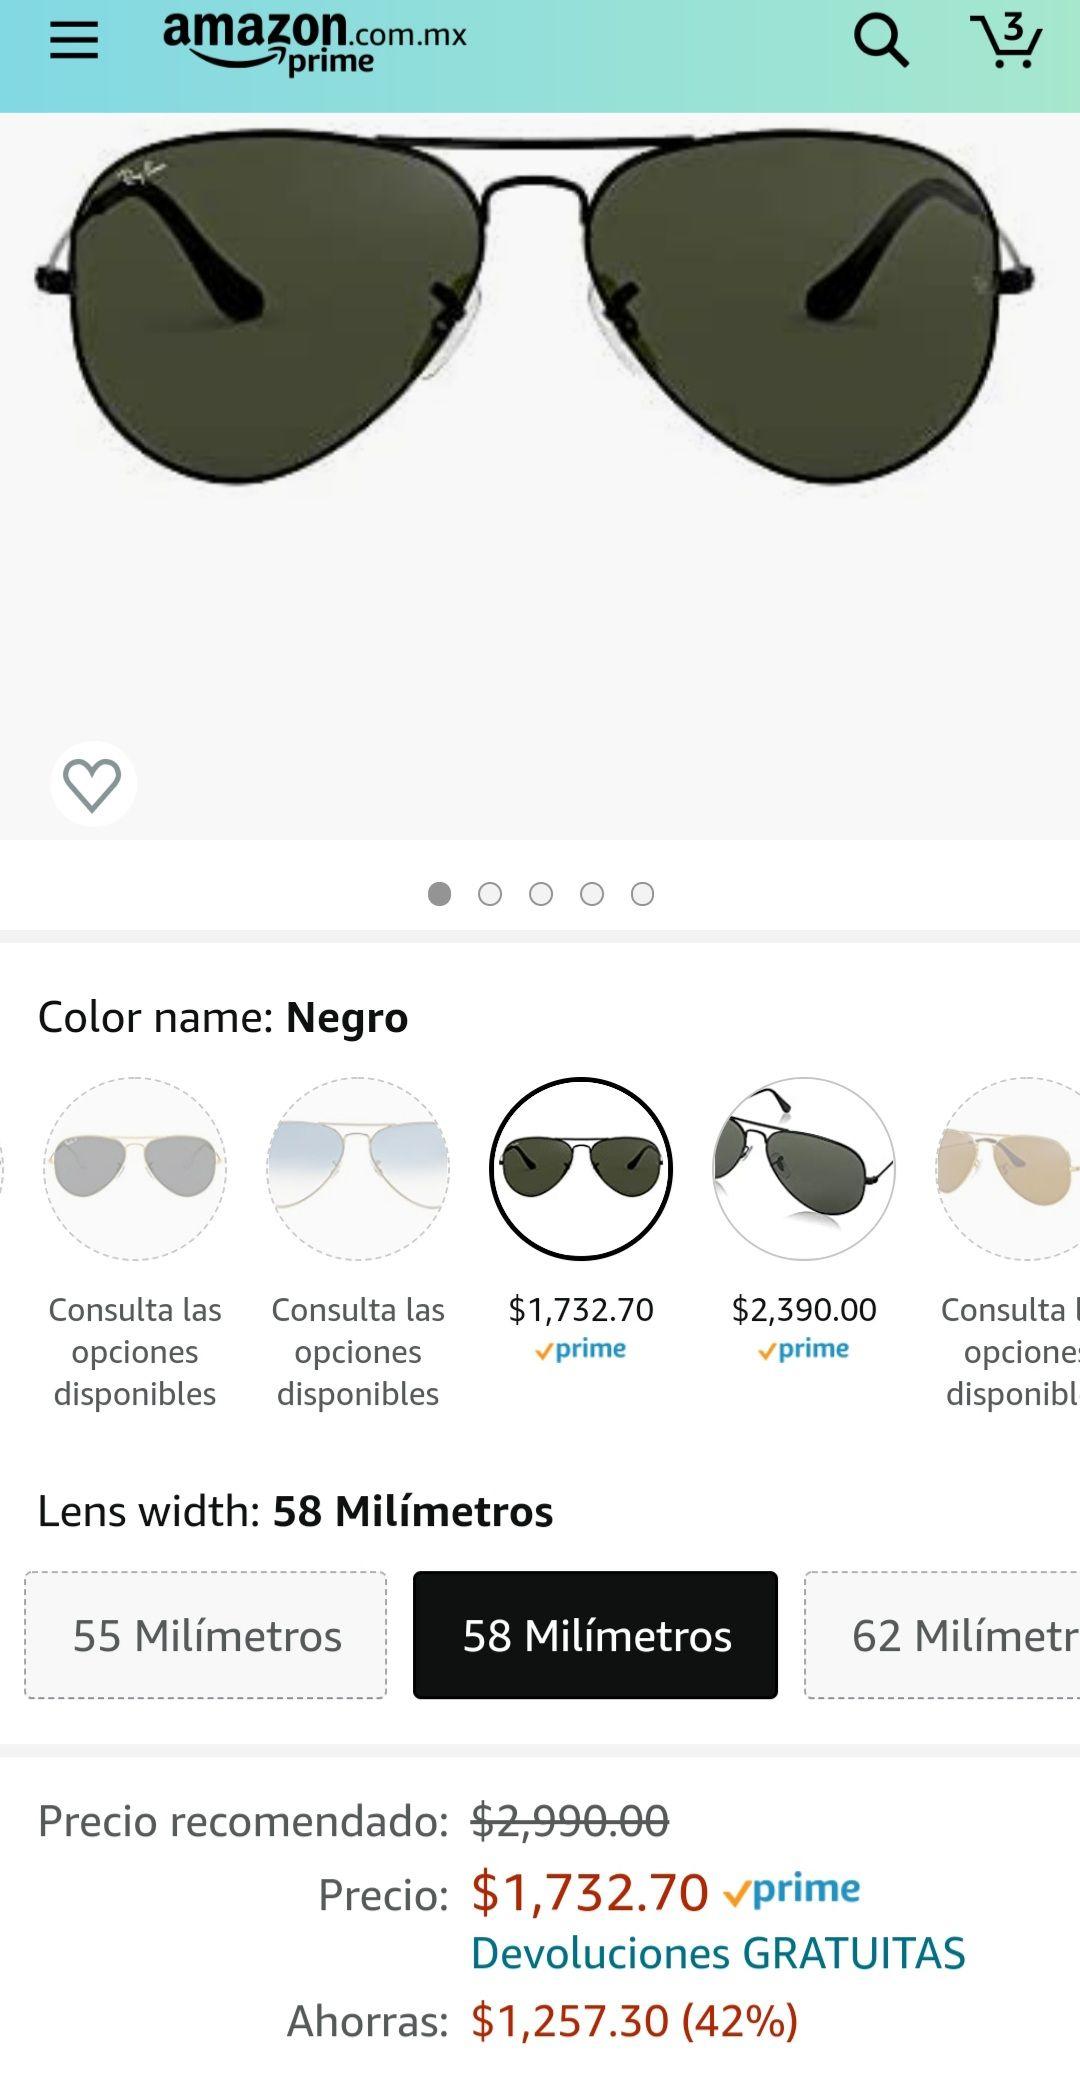 Amazon: Ray-Ban Aviator RB3025 Large Metal Aviator Sunglasses